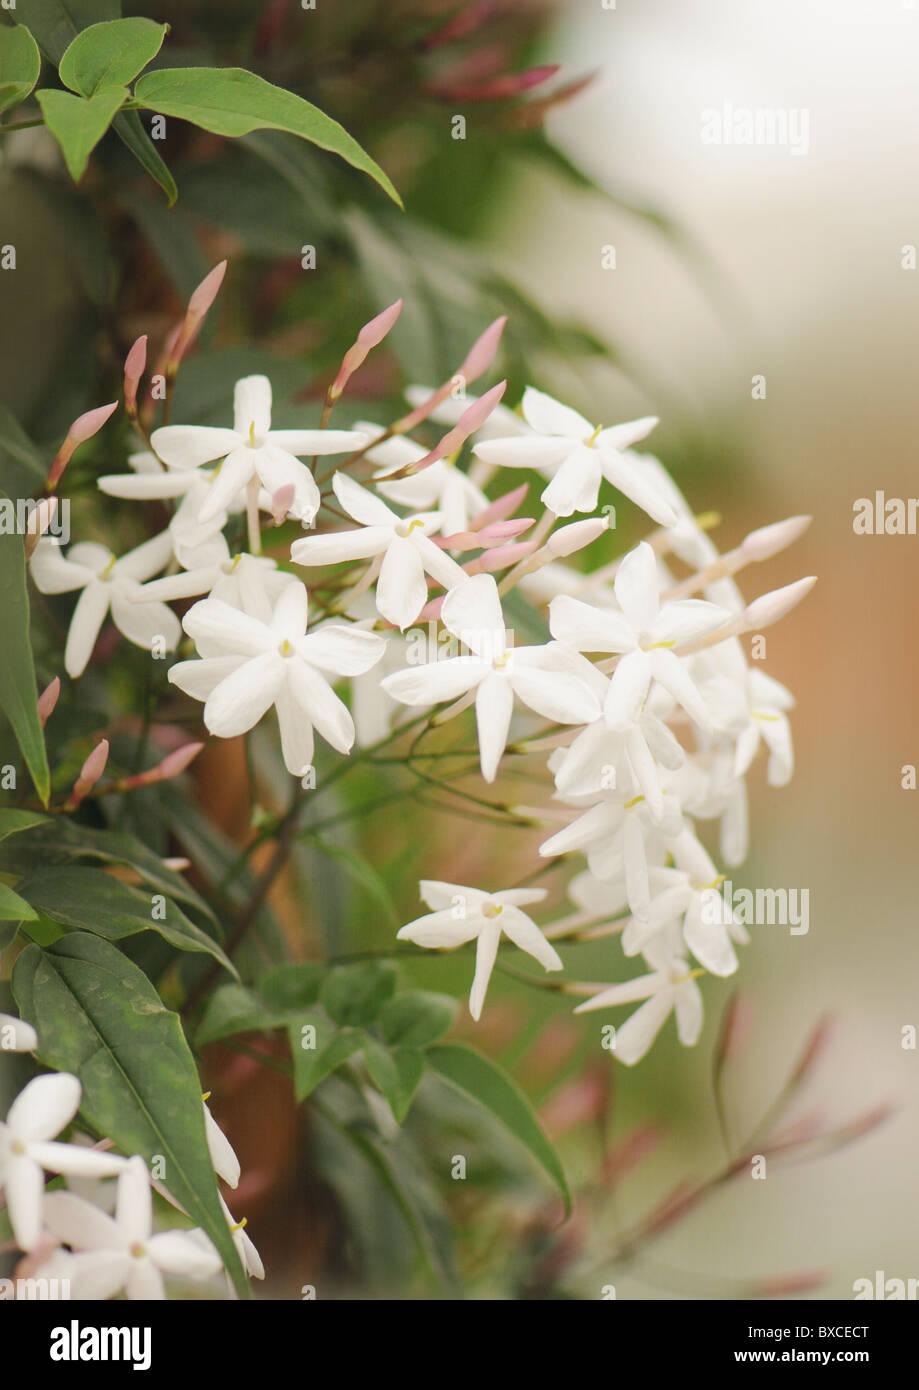 The Delicate White Flowers Of Jasminum Polyanthum Pink Jasmine